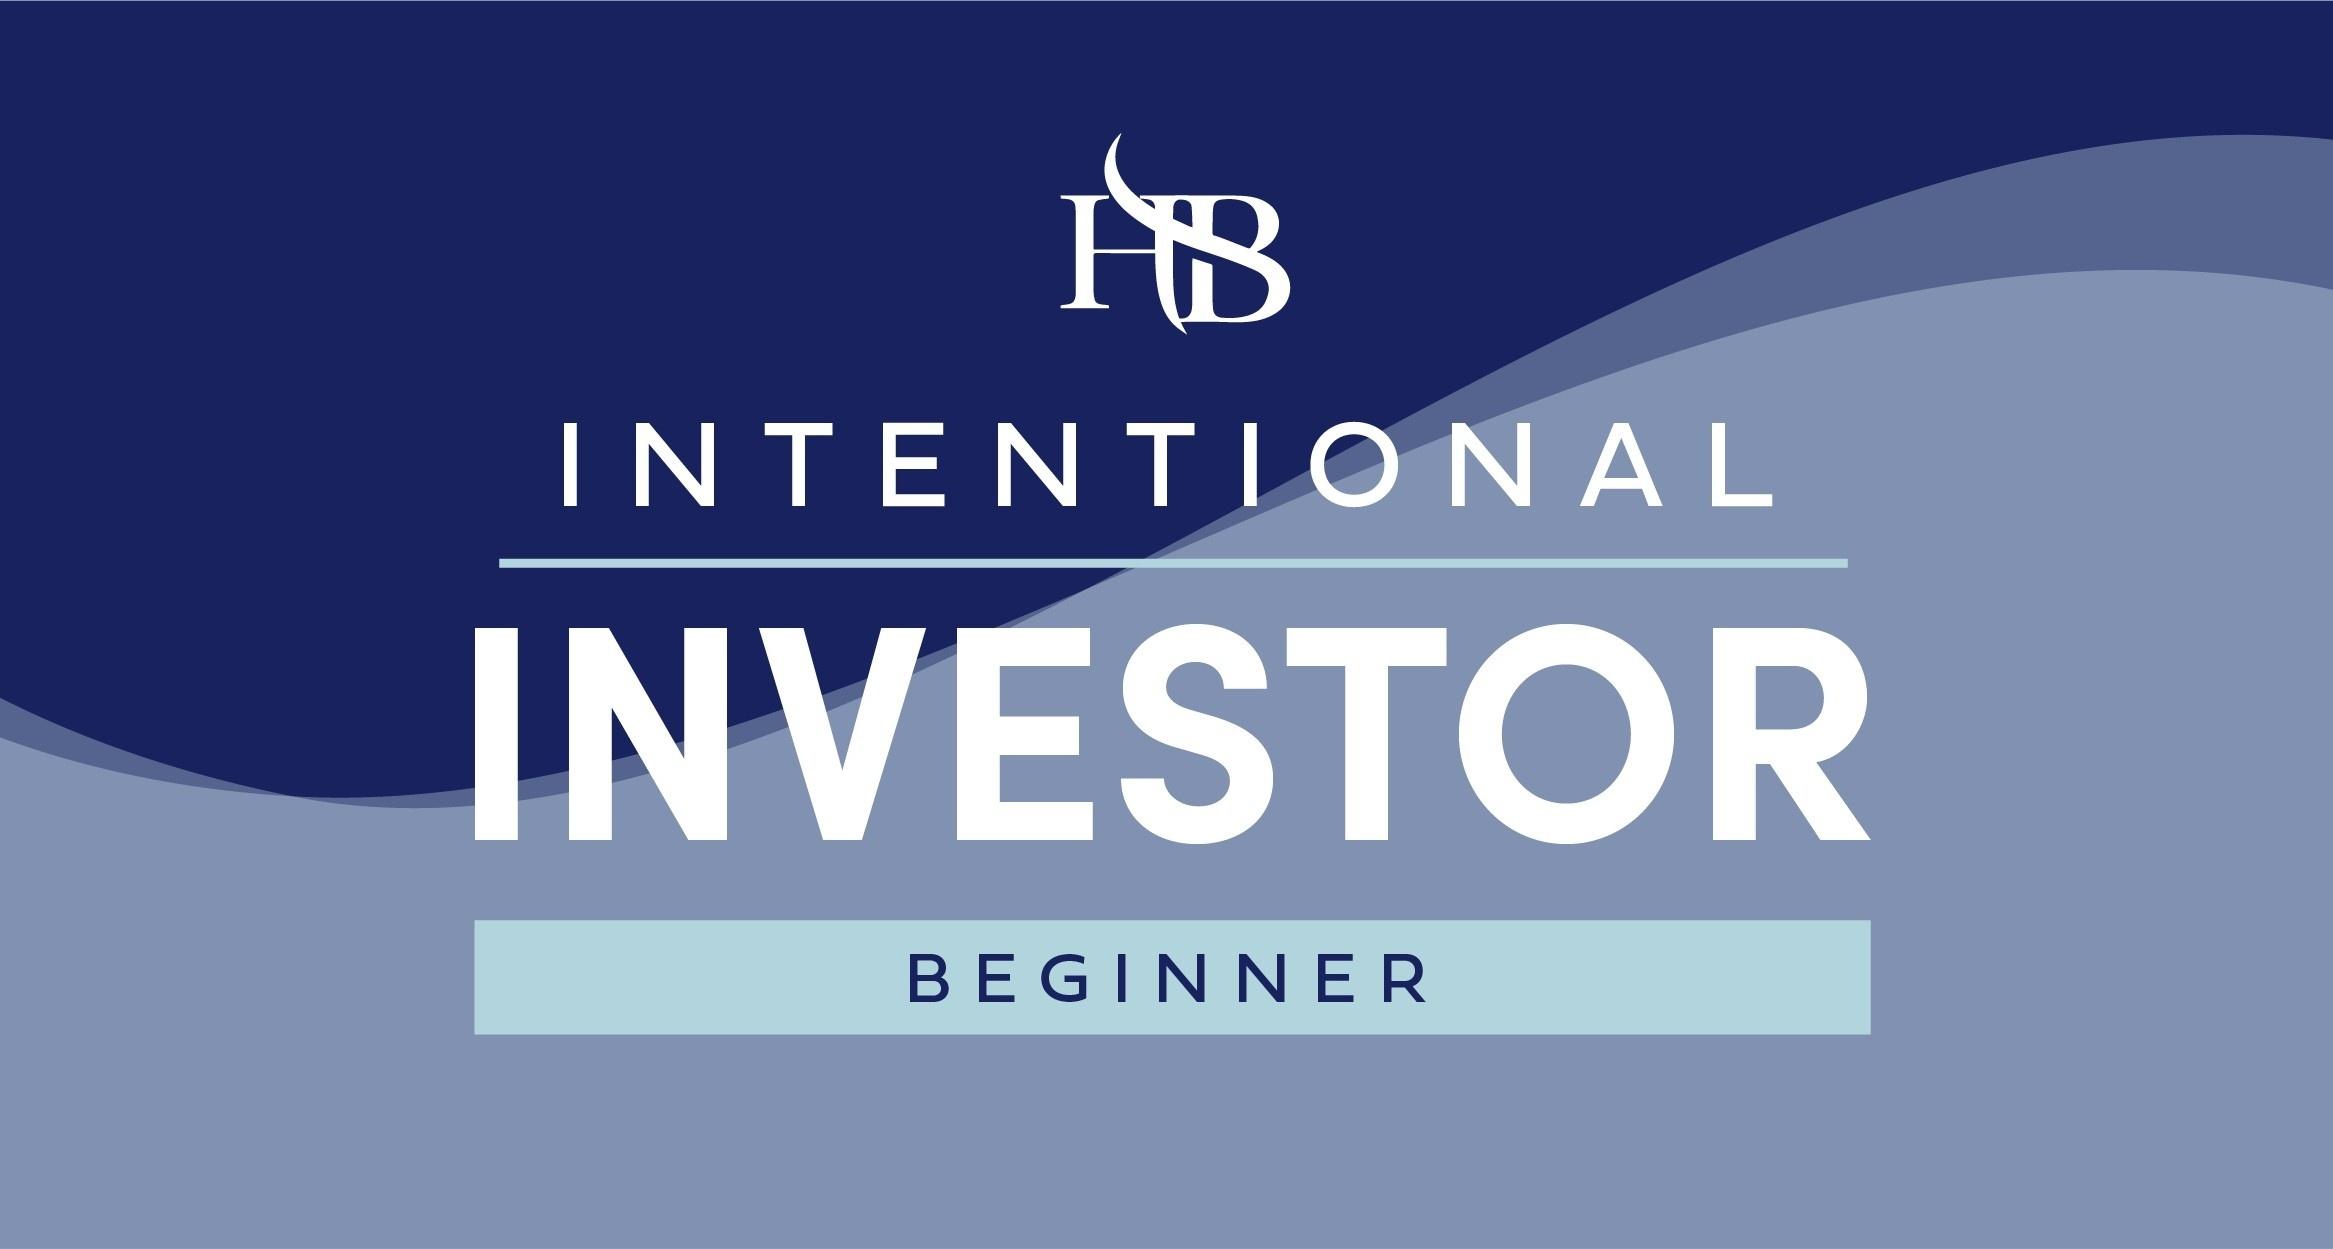 The Intentional Investor: Beginner